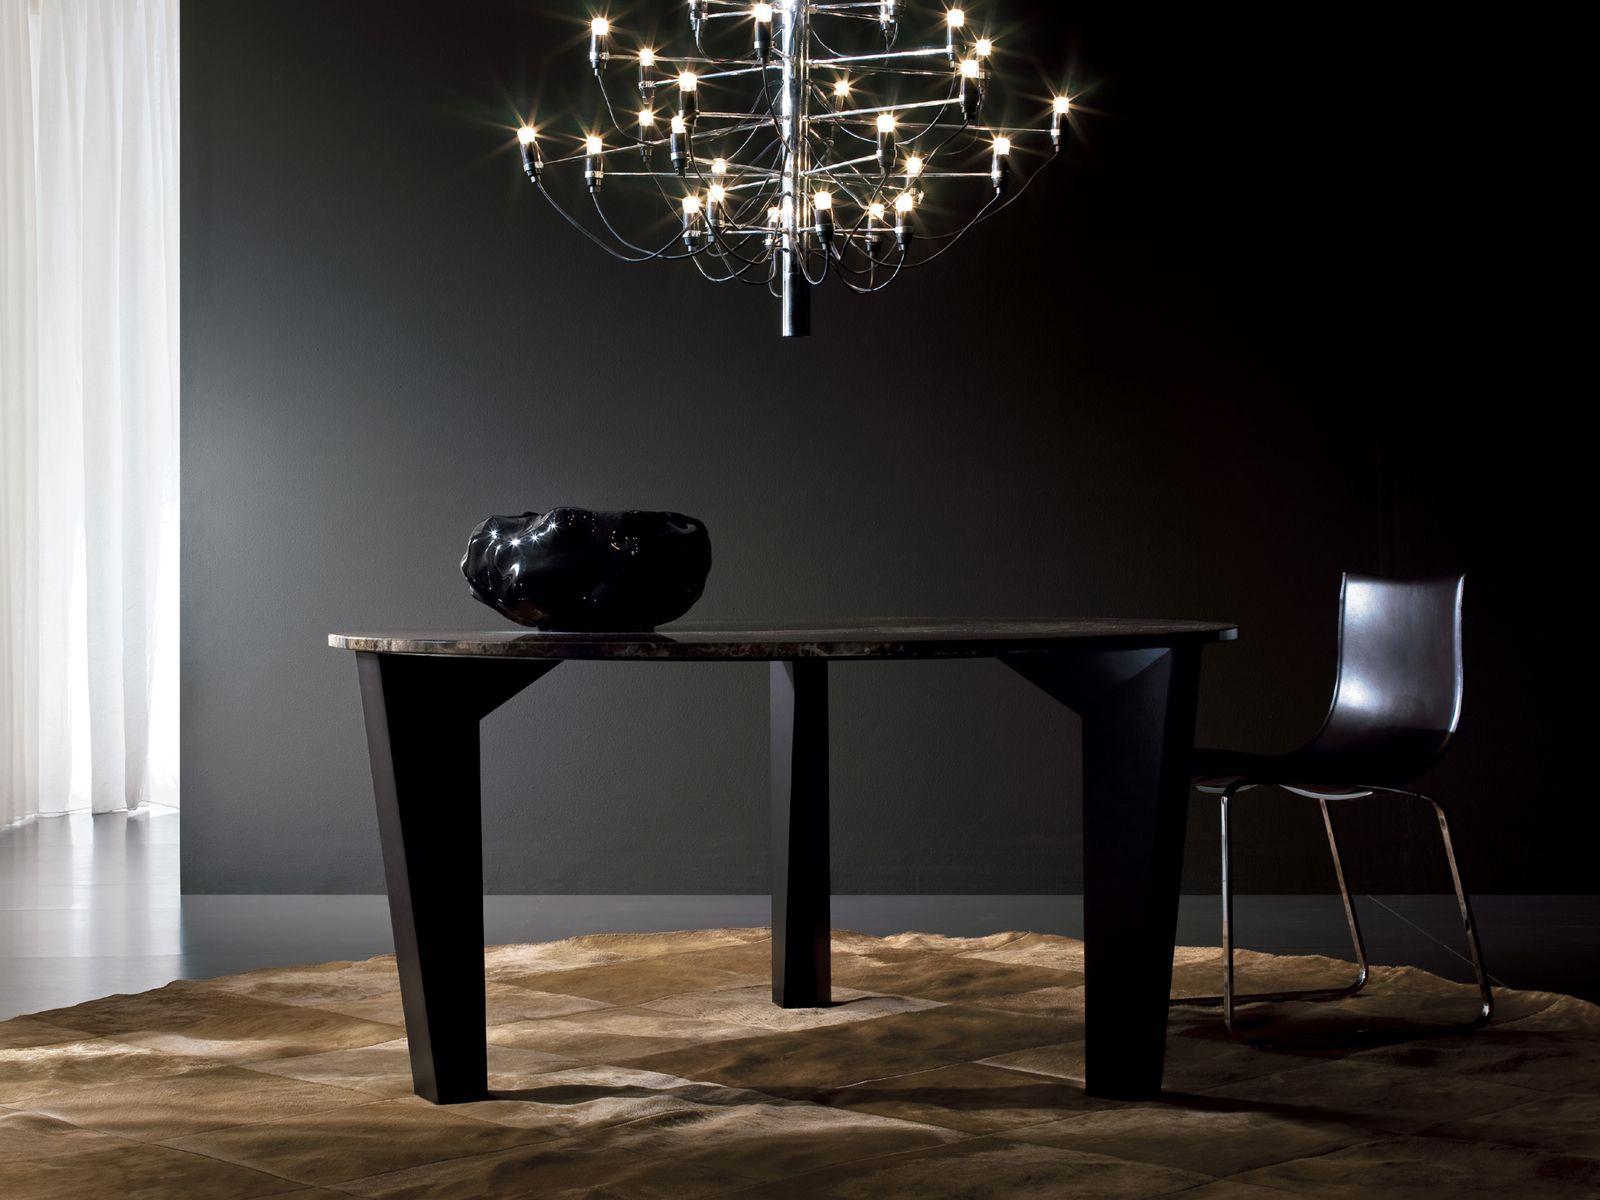 Mesh tavolo by i 4 mariani design mauro lipparini for I 4 mariani